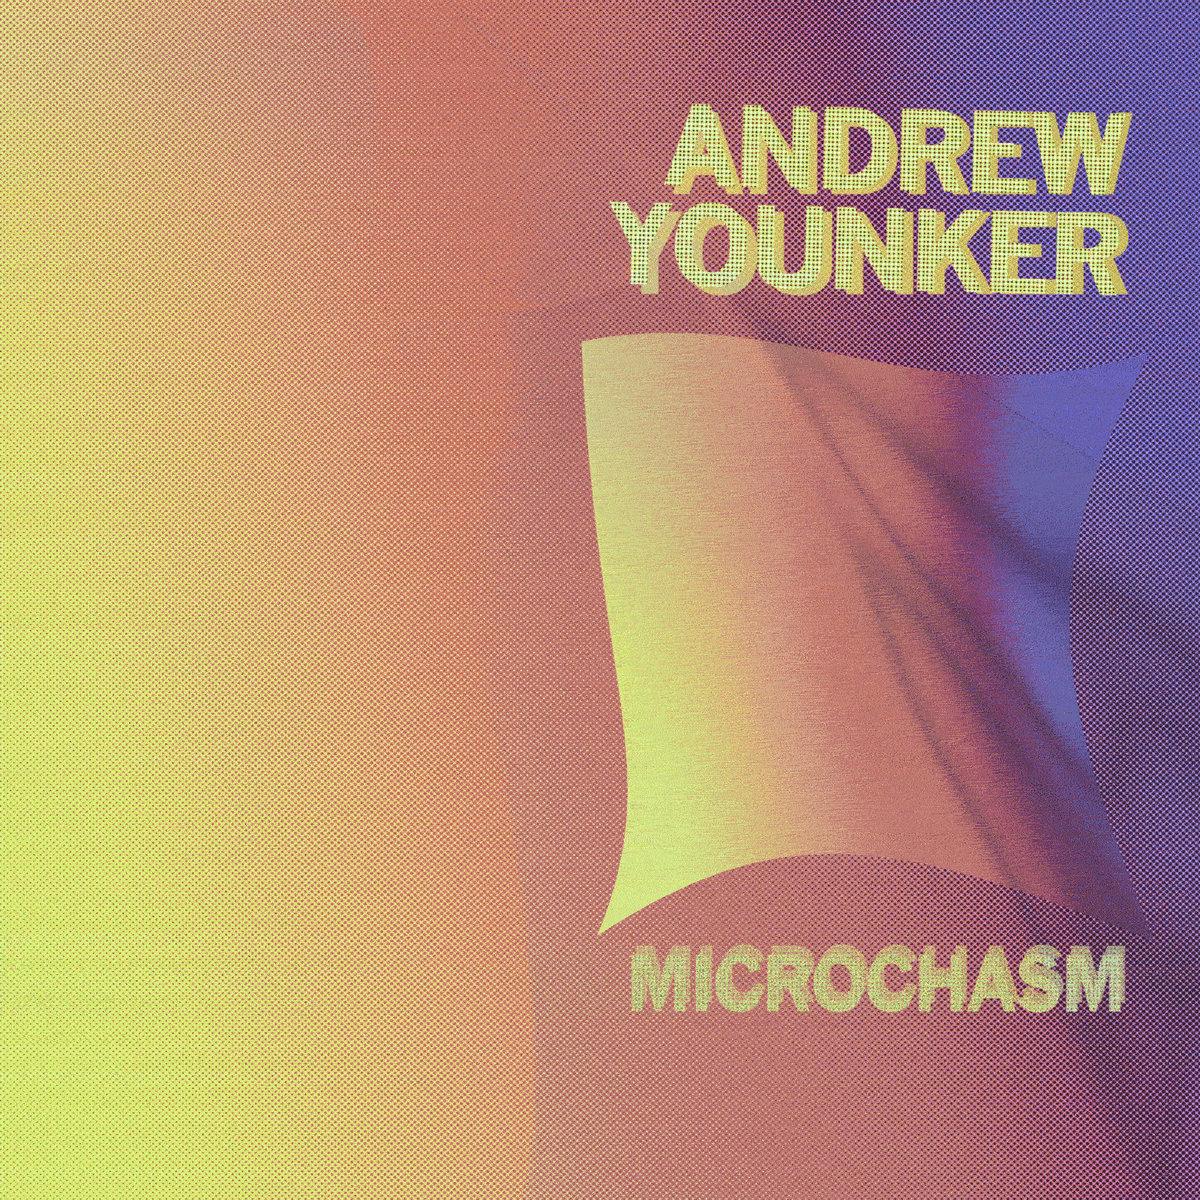 andrew younker microchasm album art